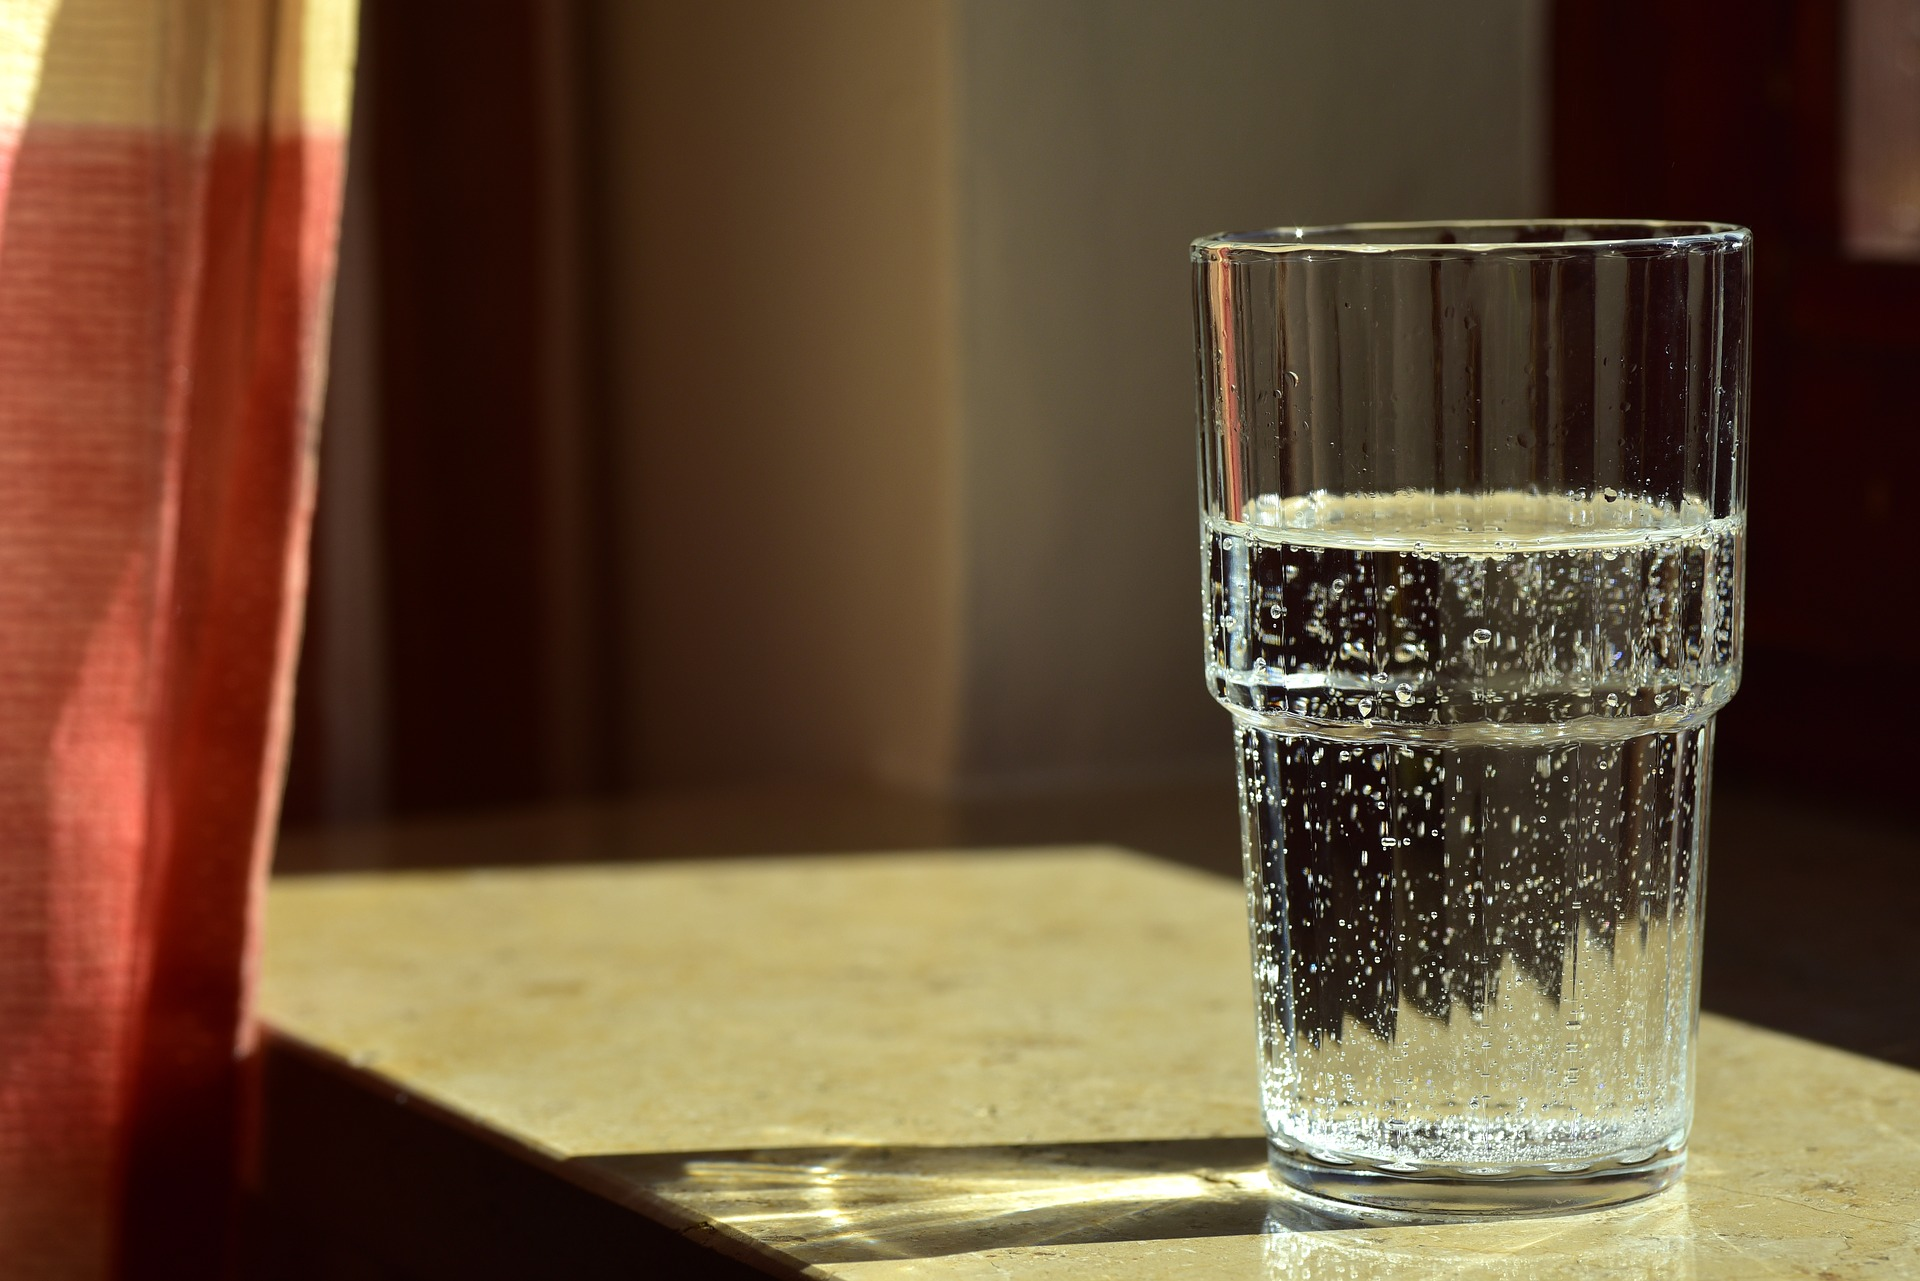 Volles Wasserglas